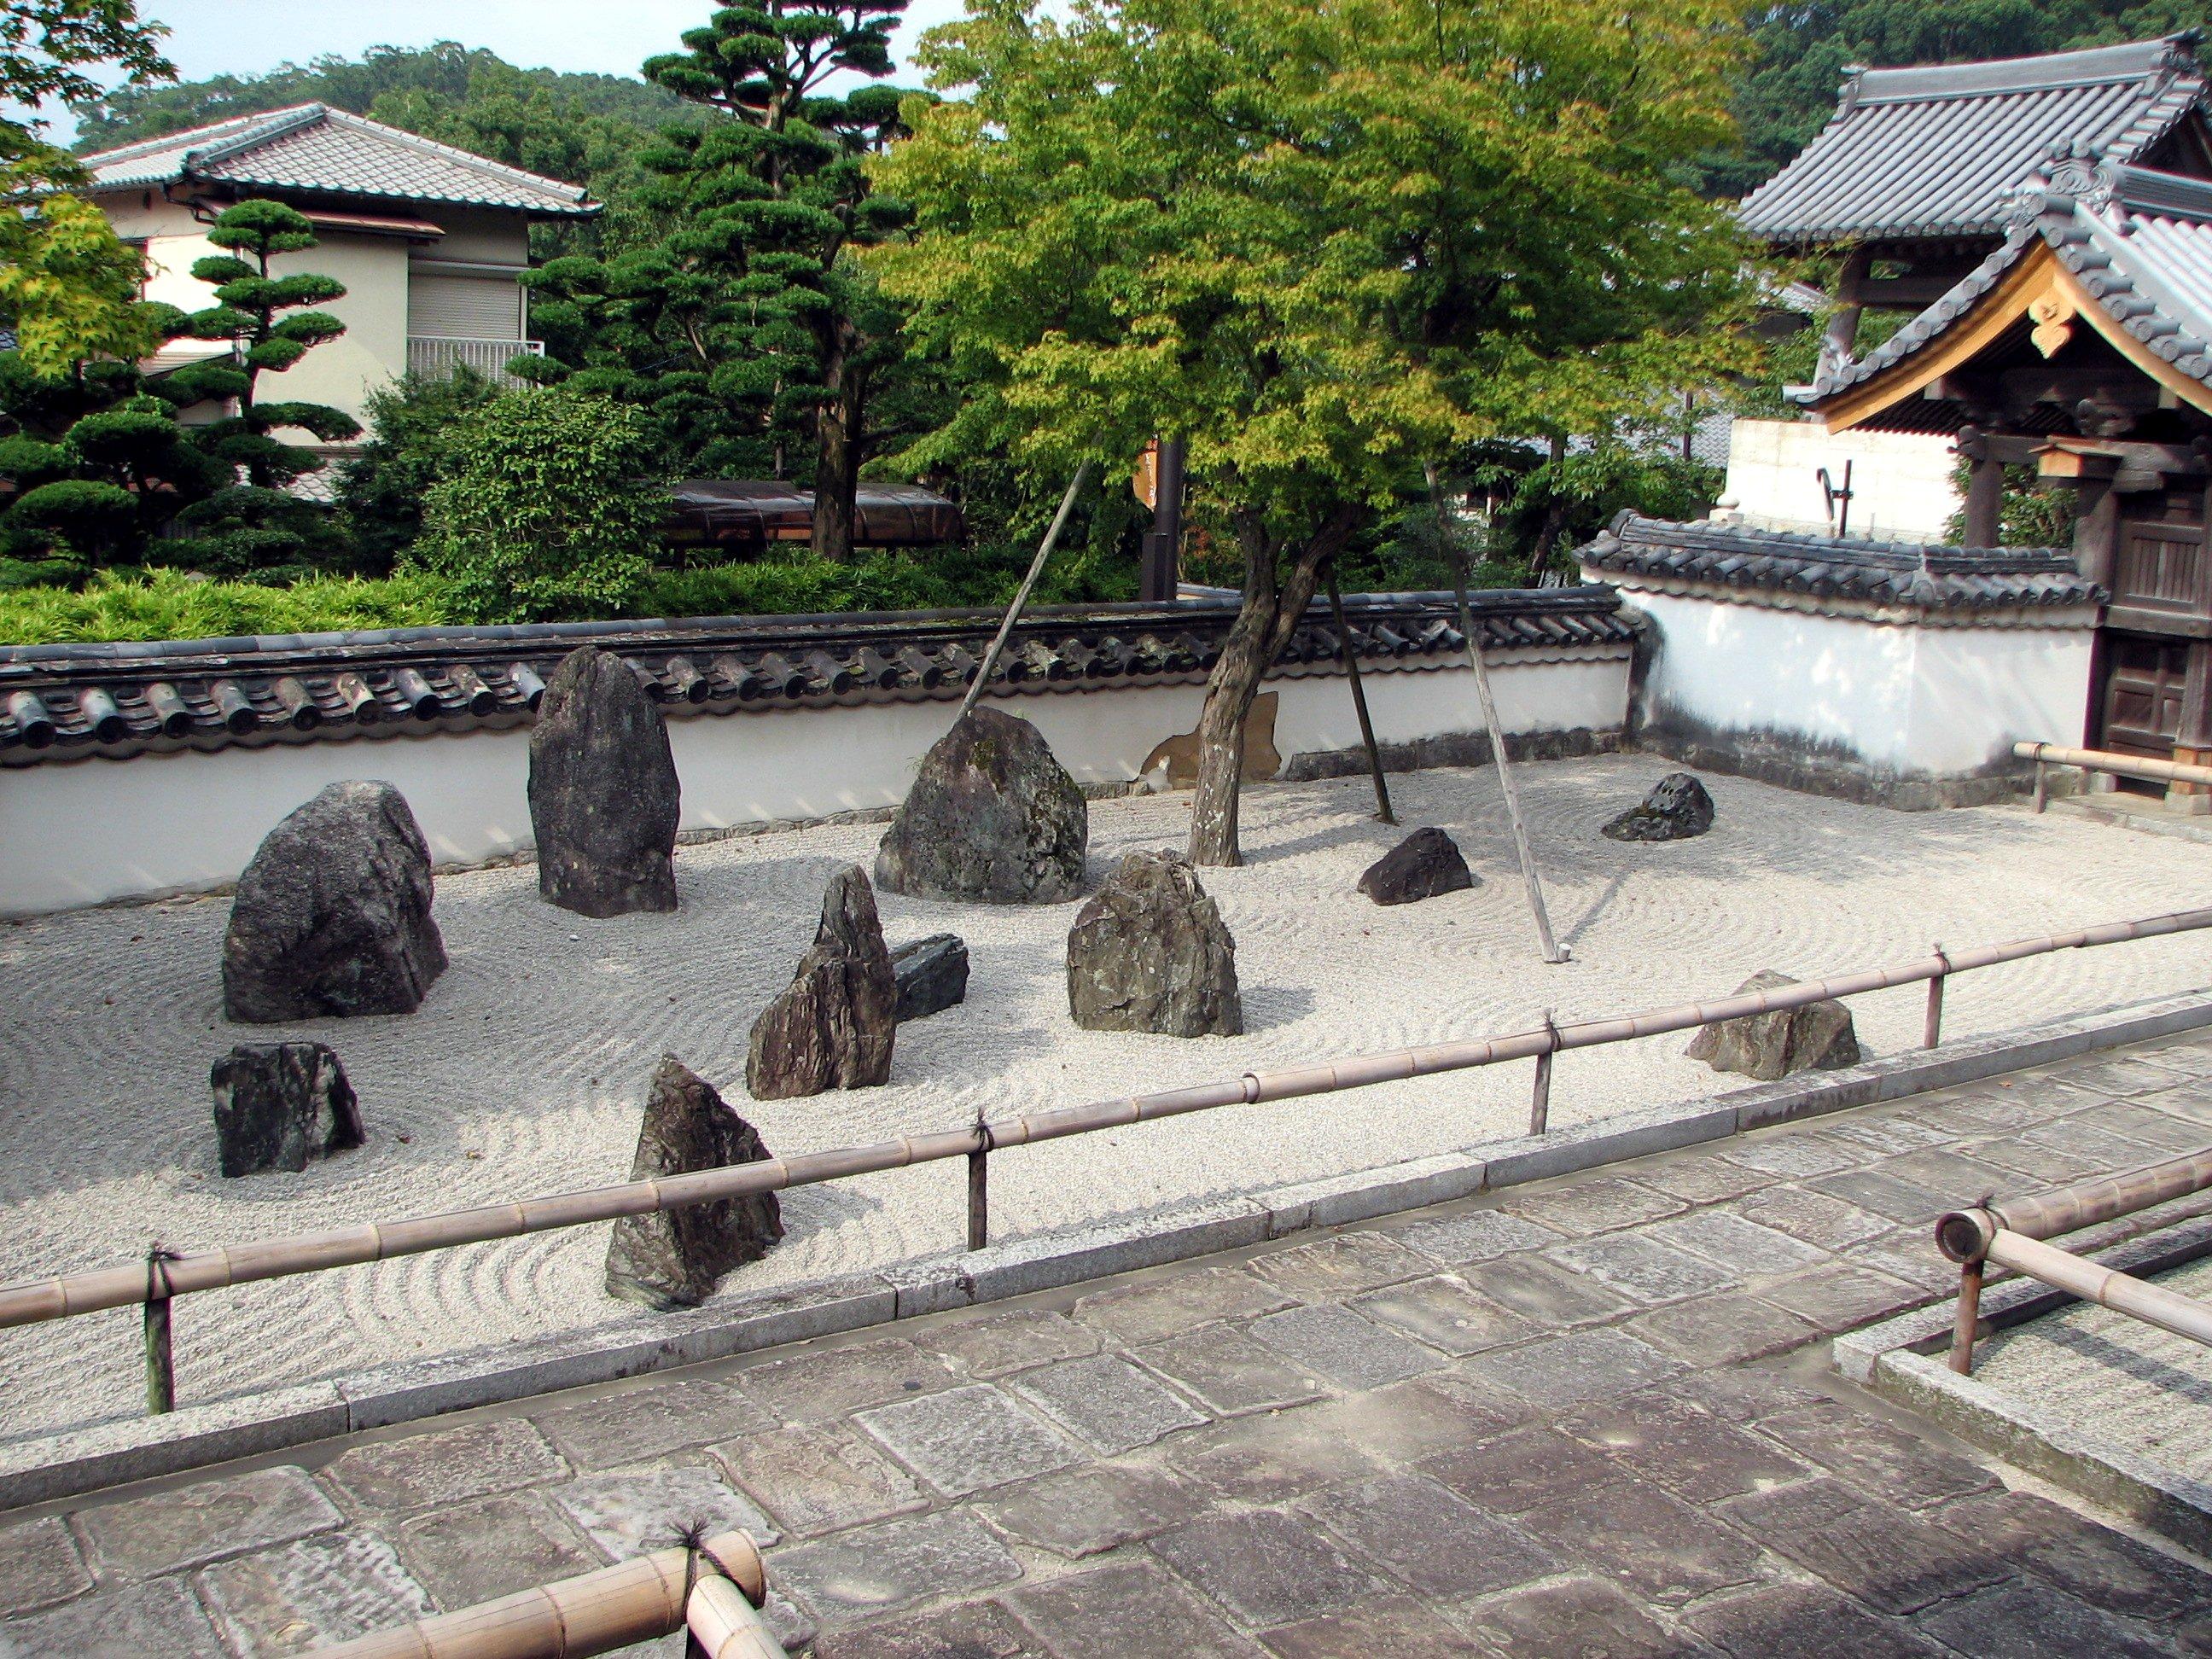 File:Komyozenji Stone Garden 2.JPG